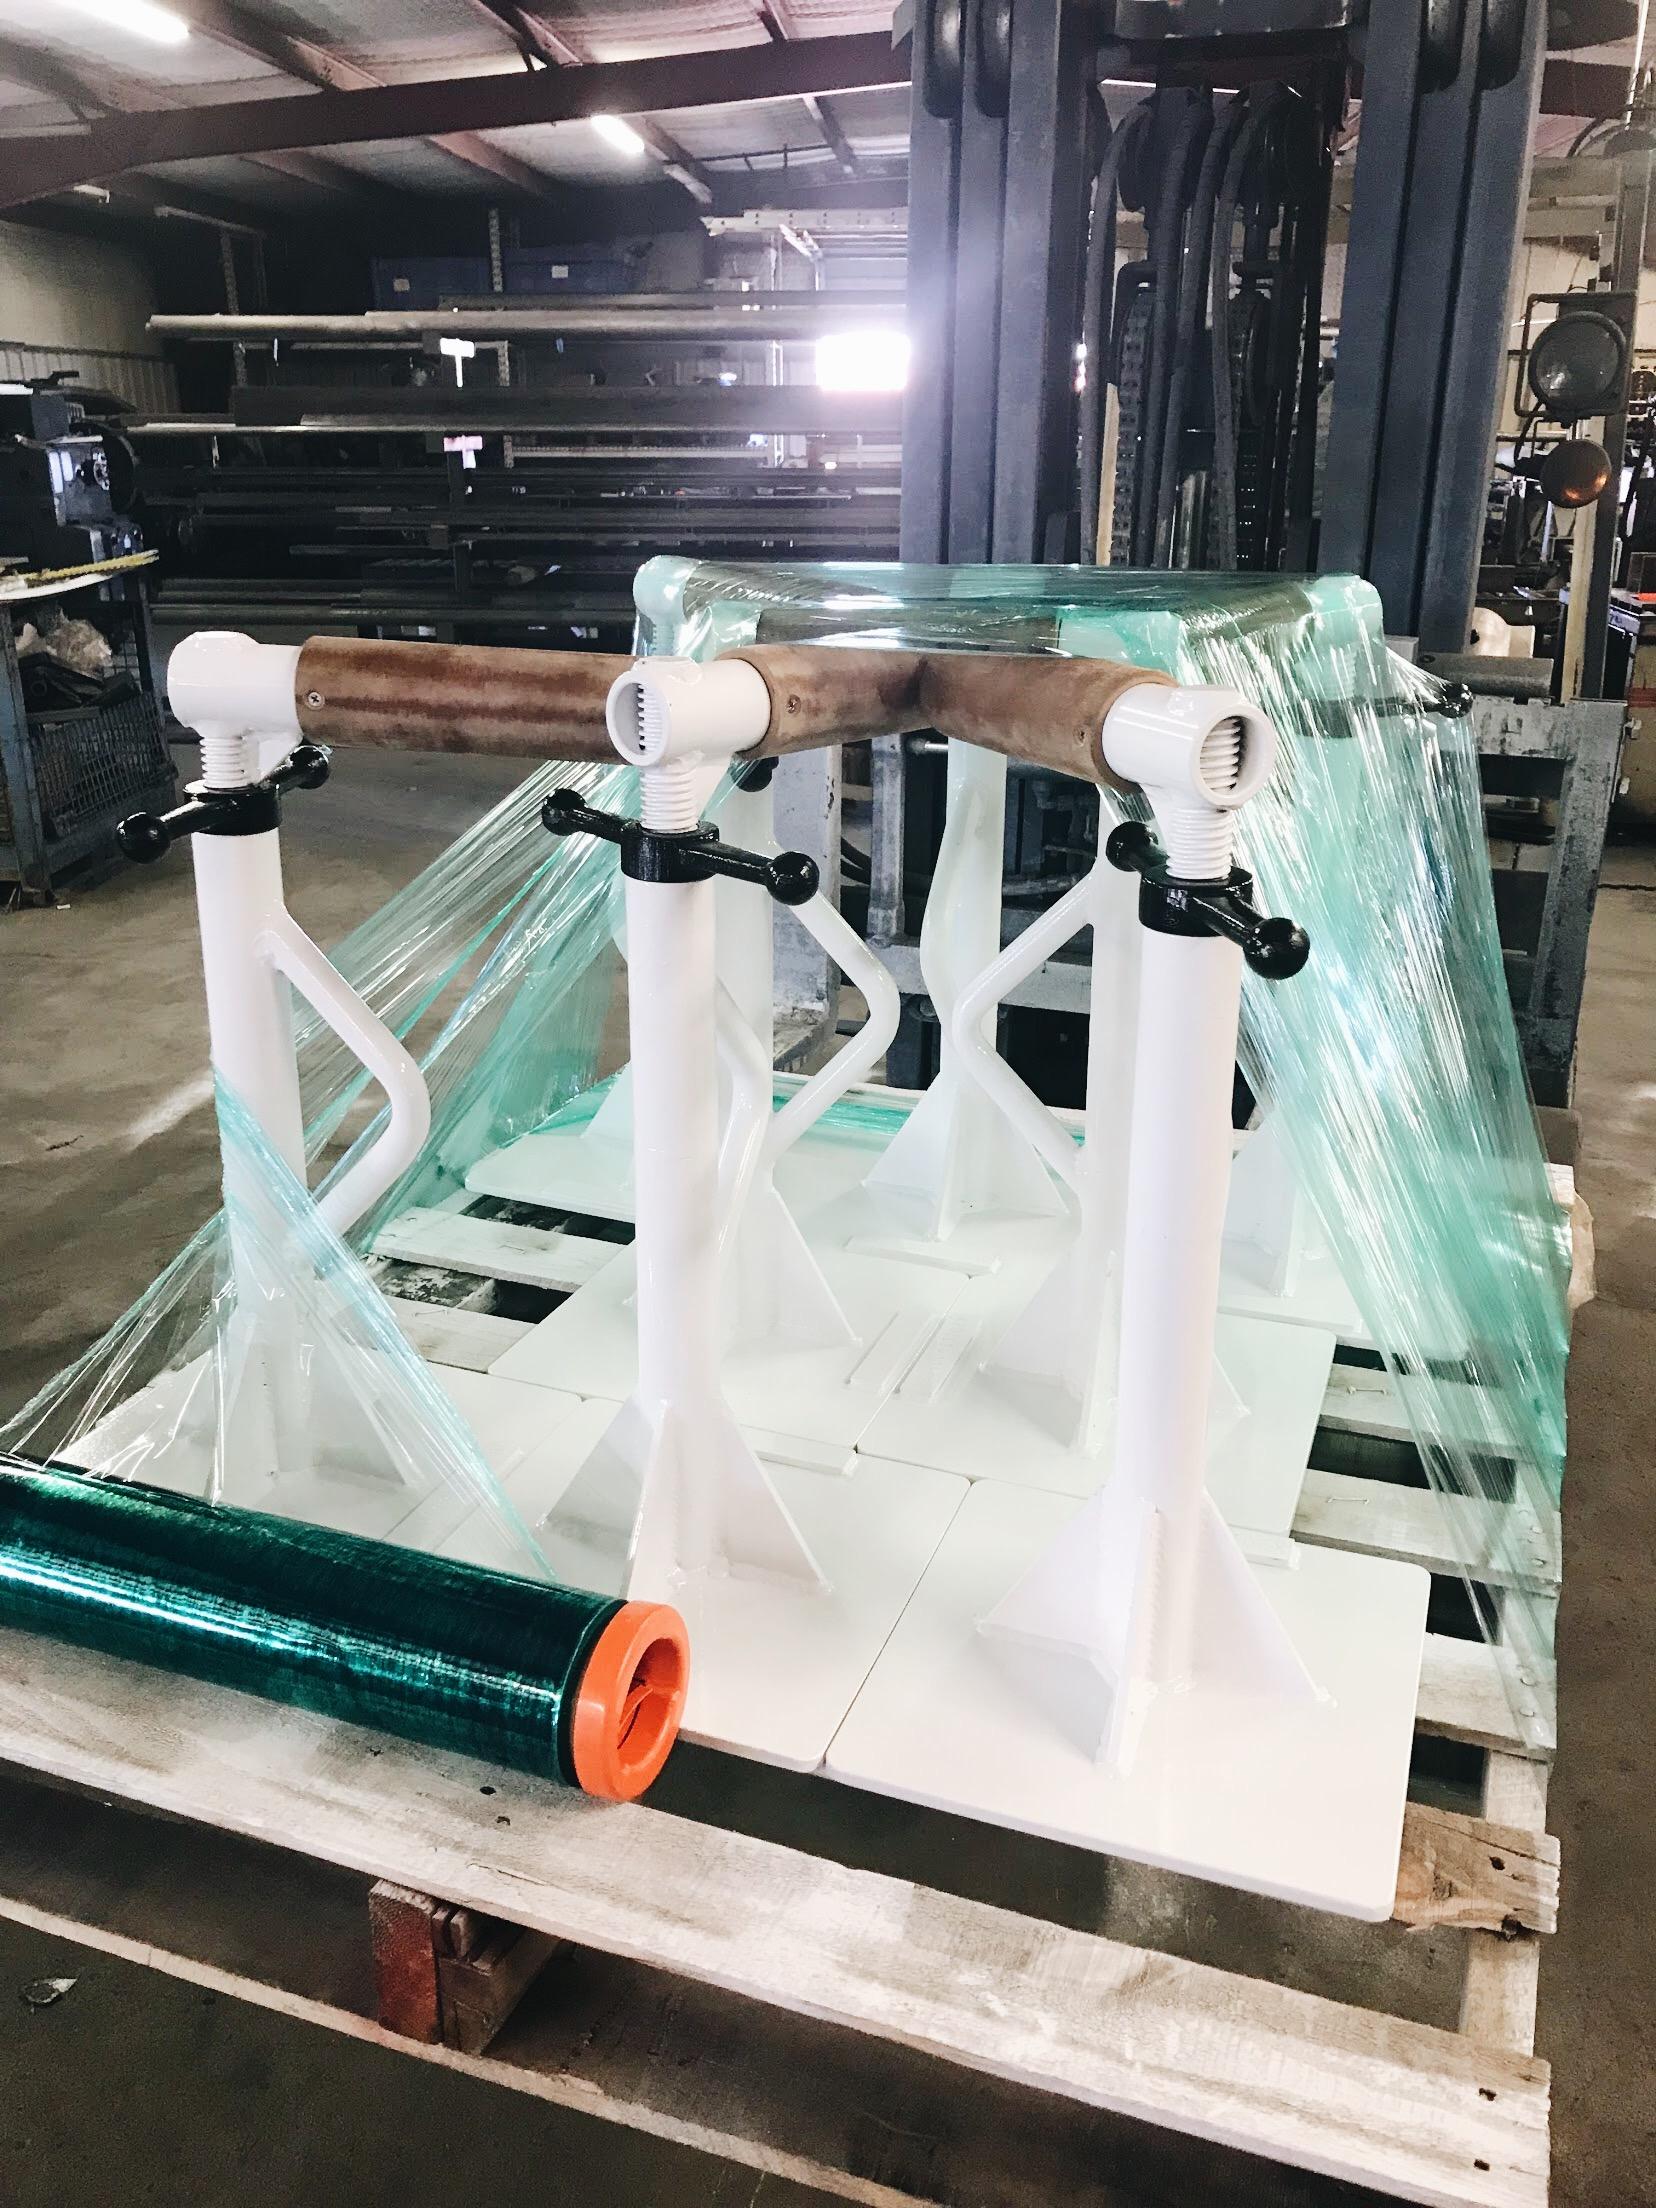 fabrication texas industrial machine & design 4.jpg